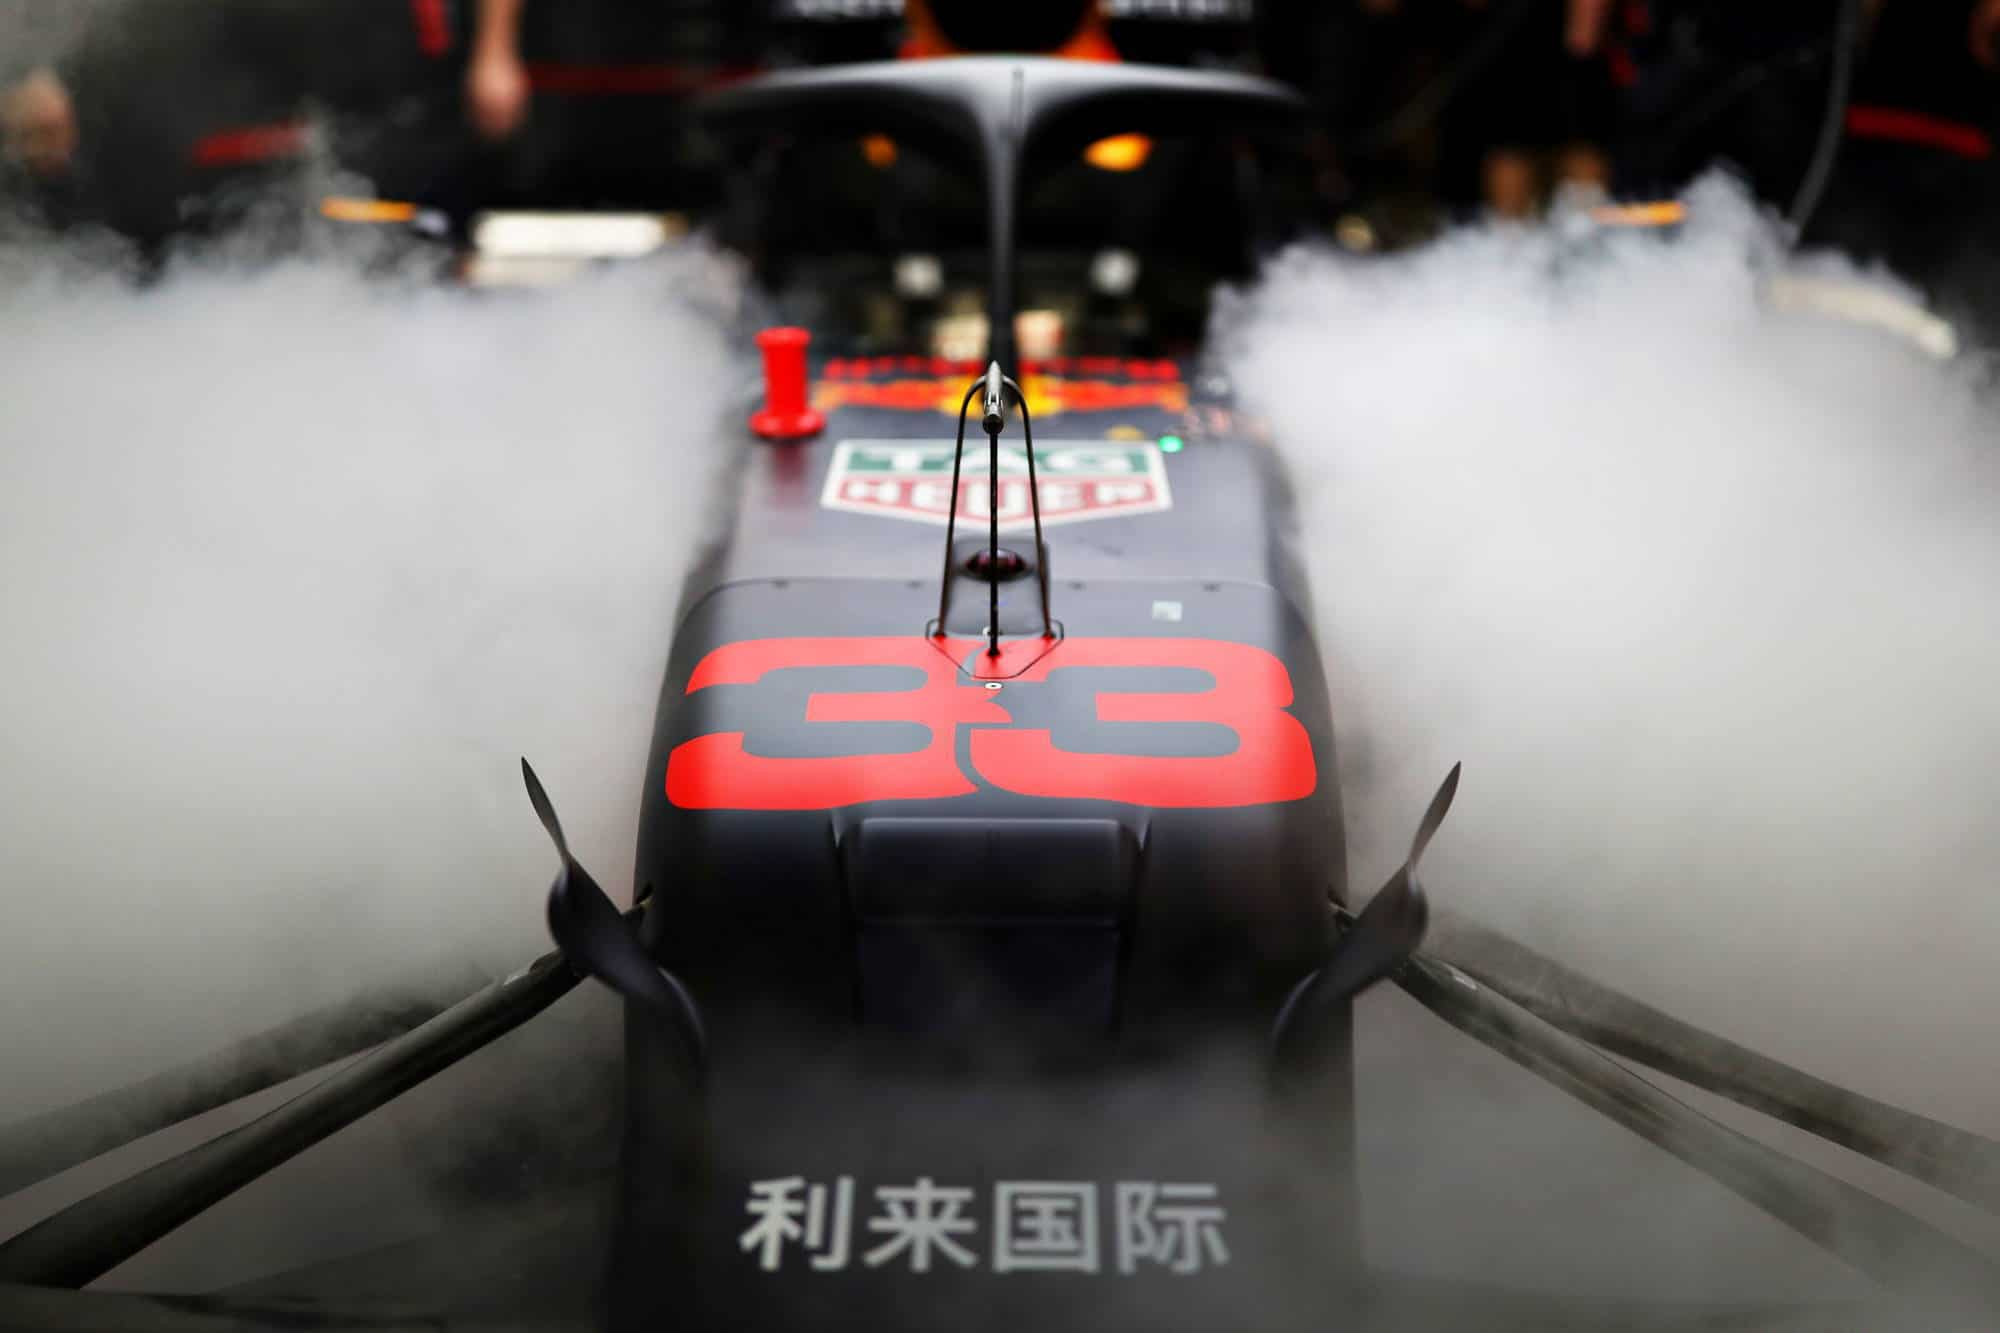 Verstappen Red Bull RB15 Abu Dhabi GP F1 2019 garage smoke Photo Red Bull